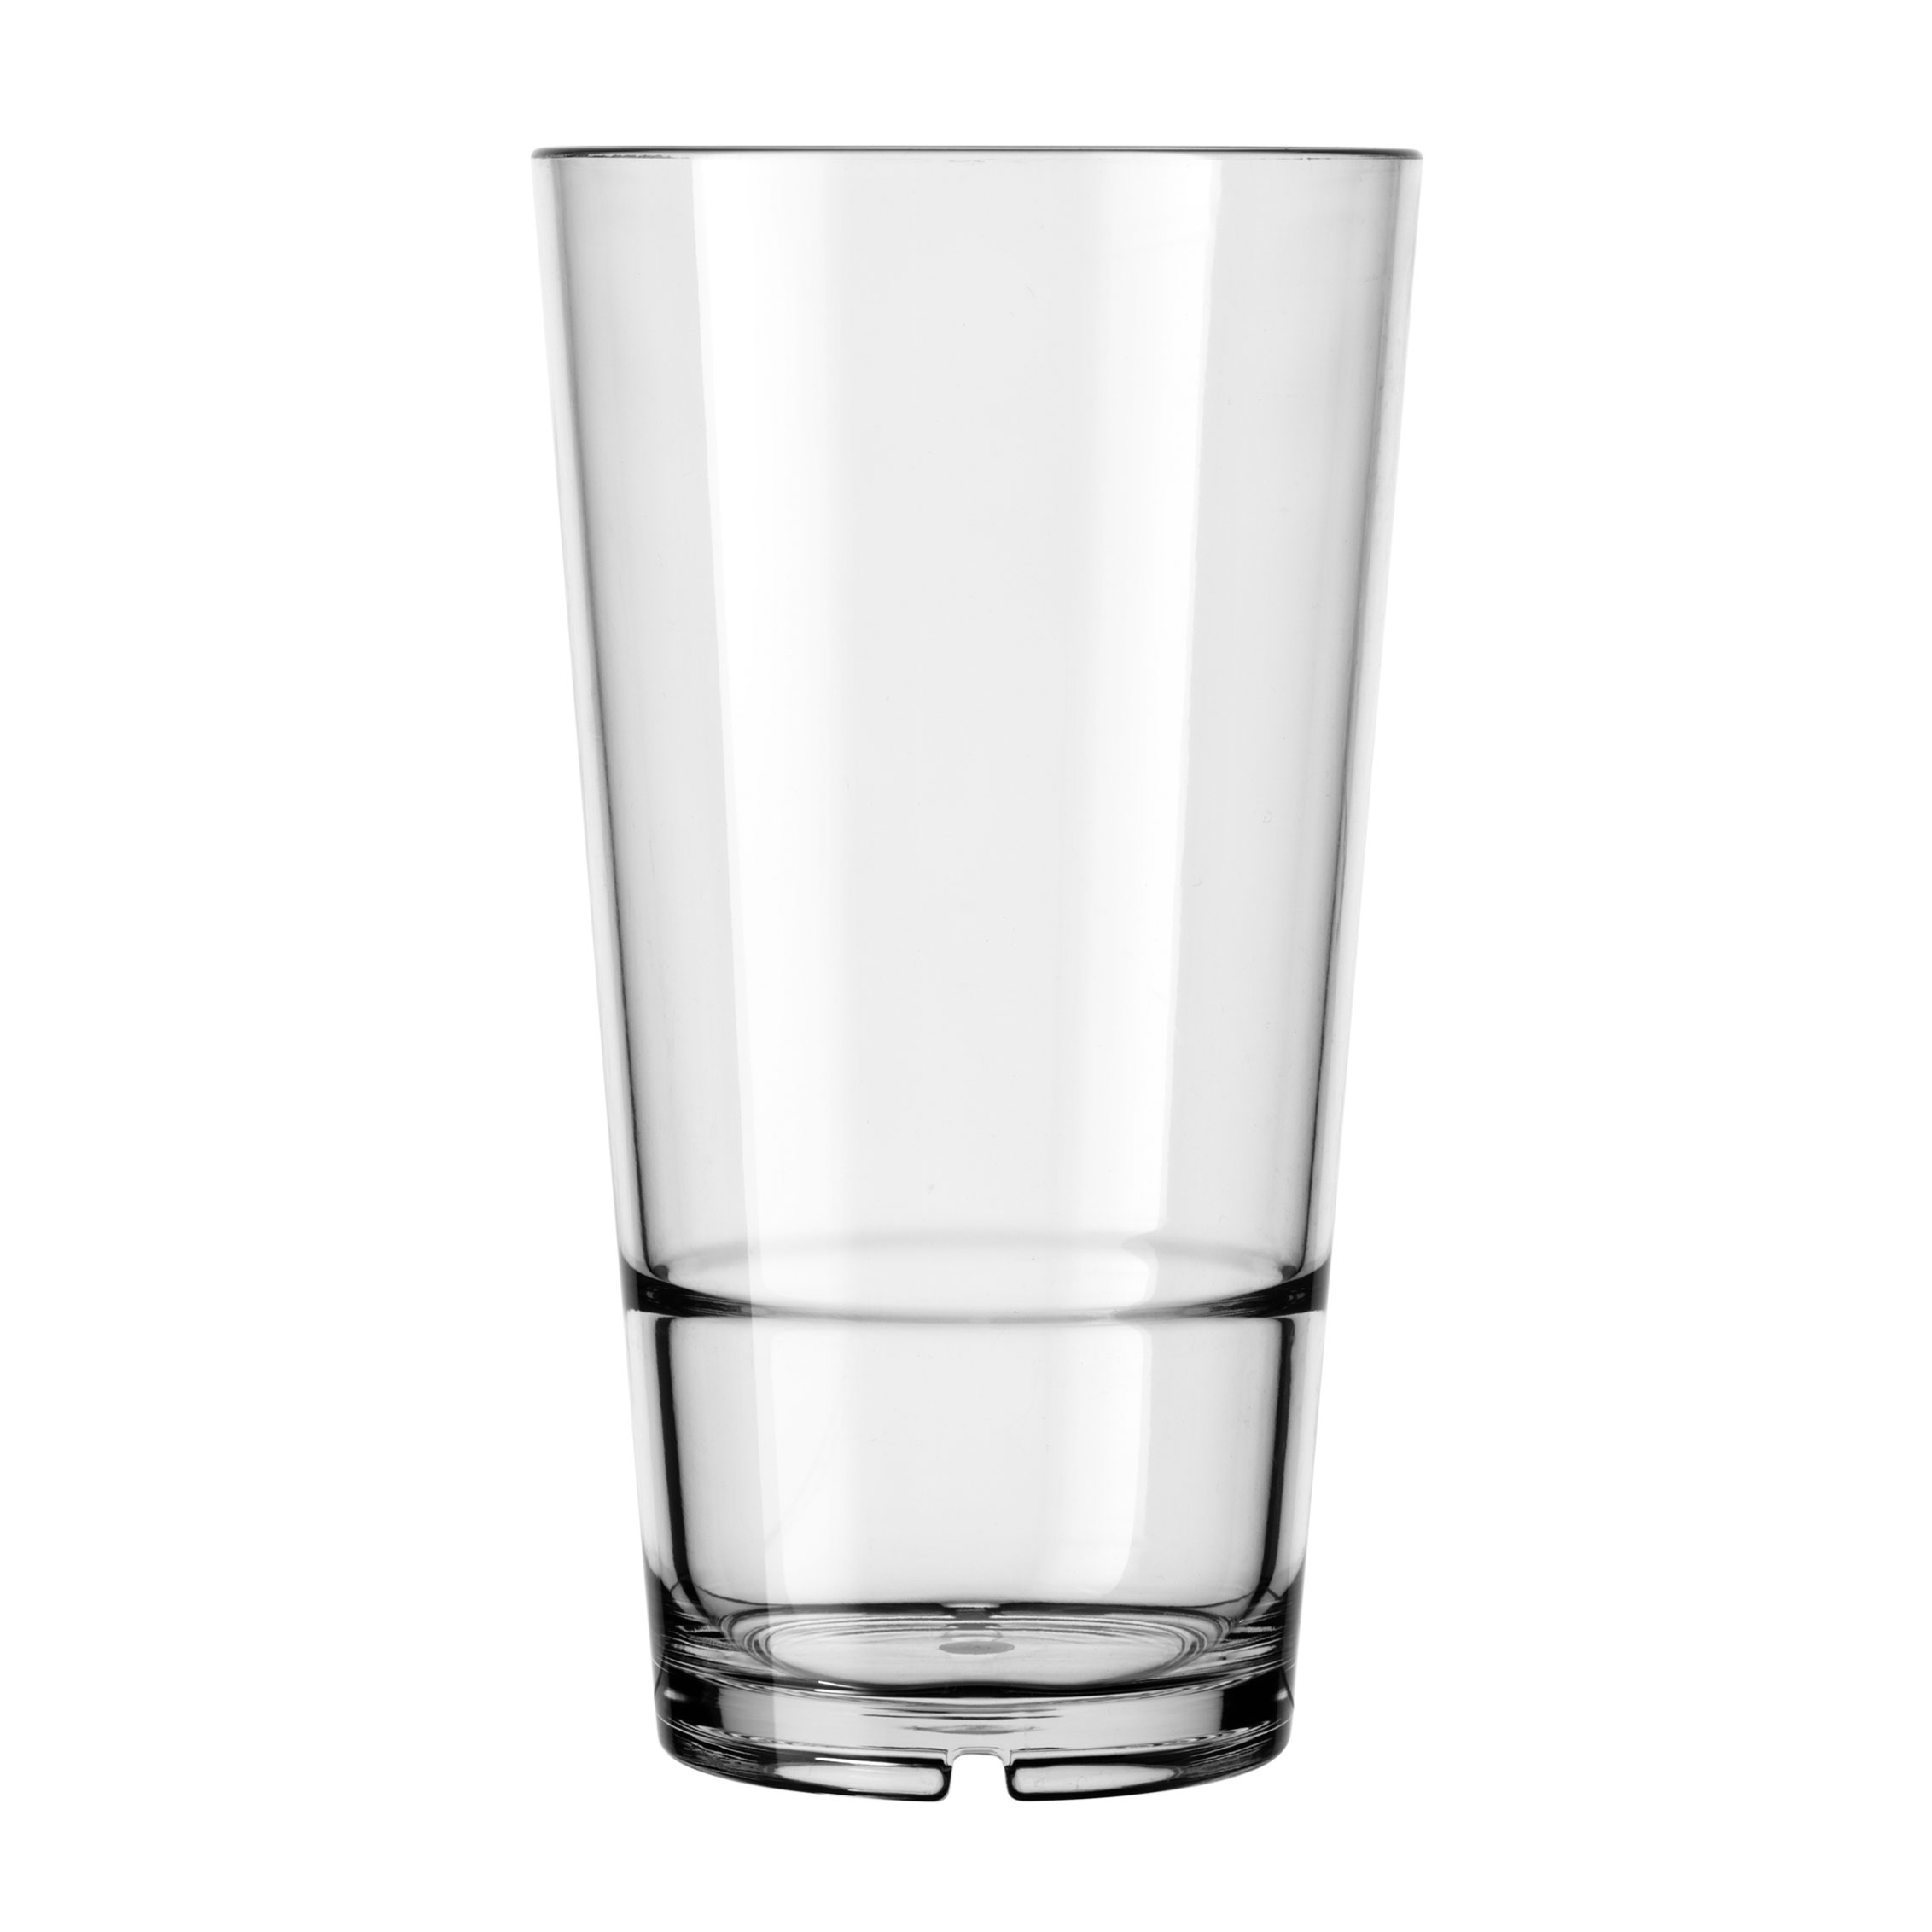 Libbey Glass 92449 glassware, plastic